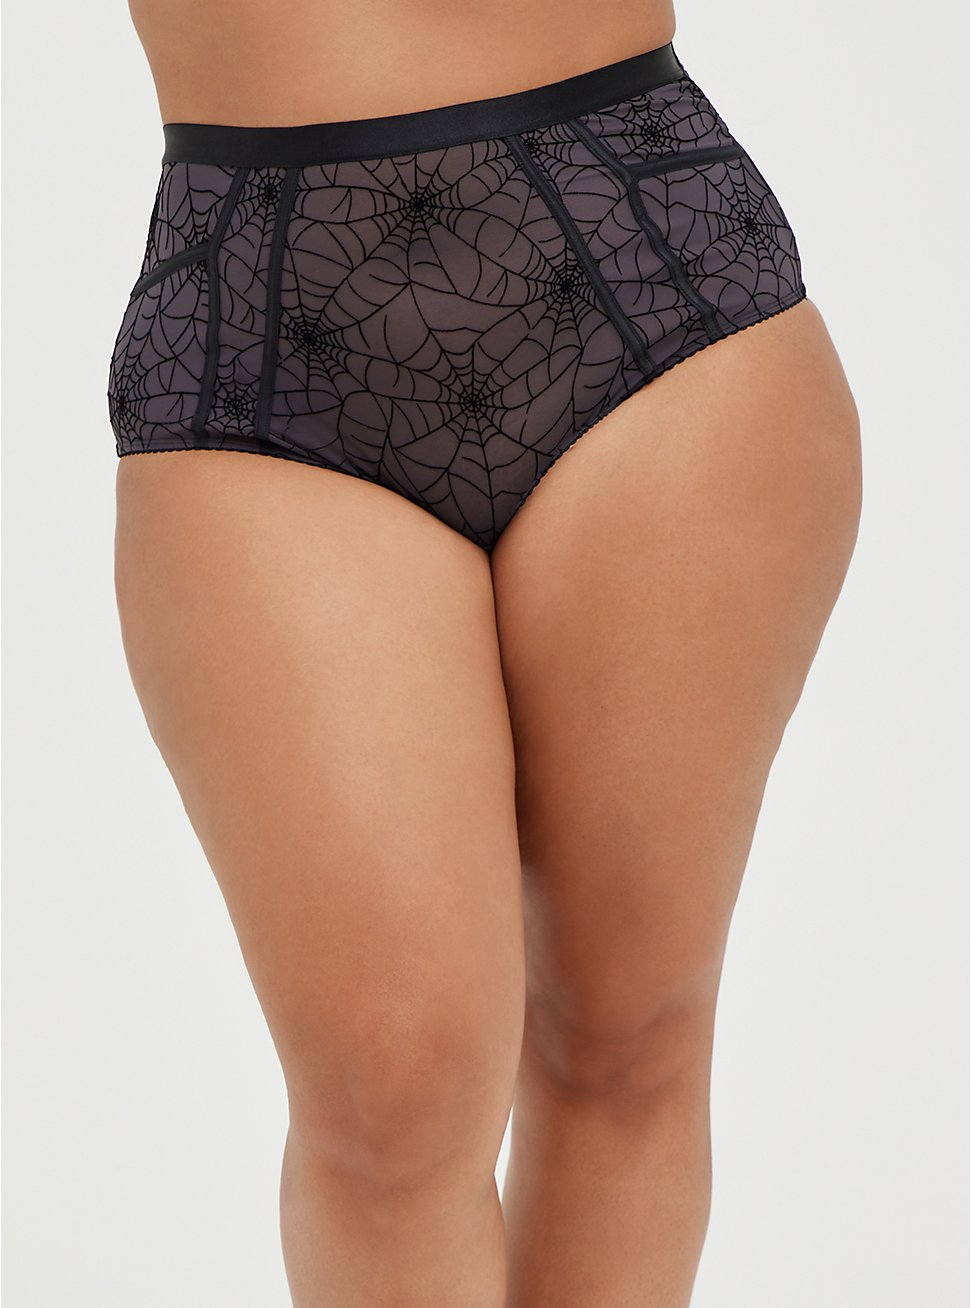 Cutout High Waist Panty - Mesh Webs Black, CAUGHT IN A WEB, hi-res